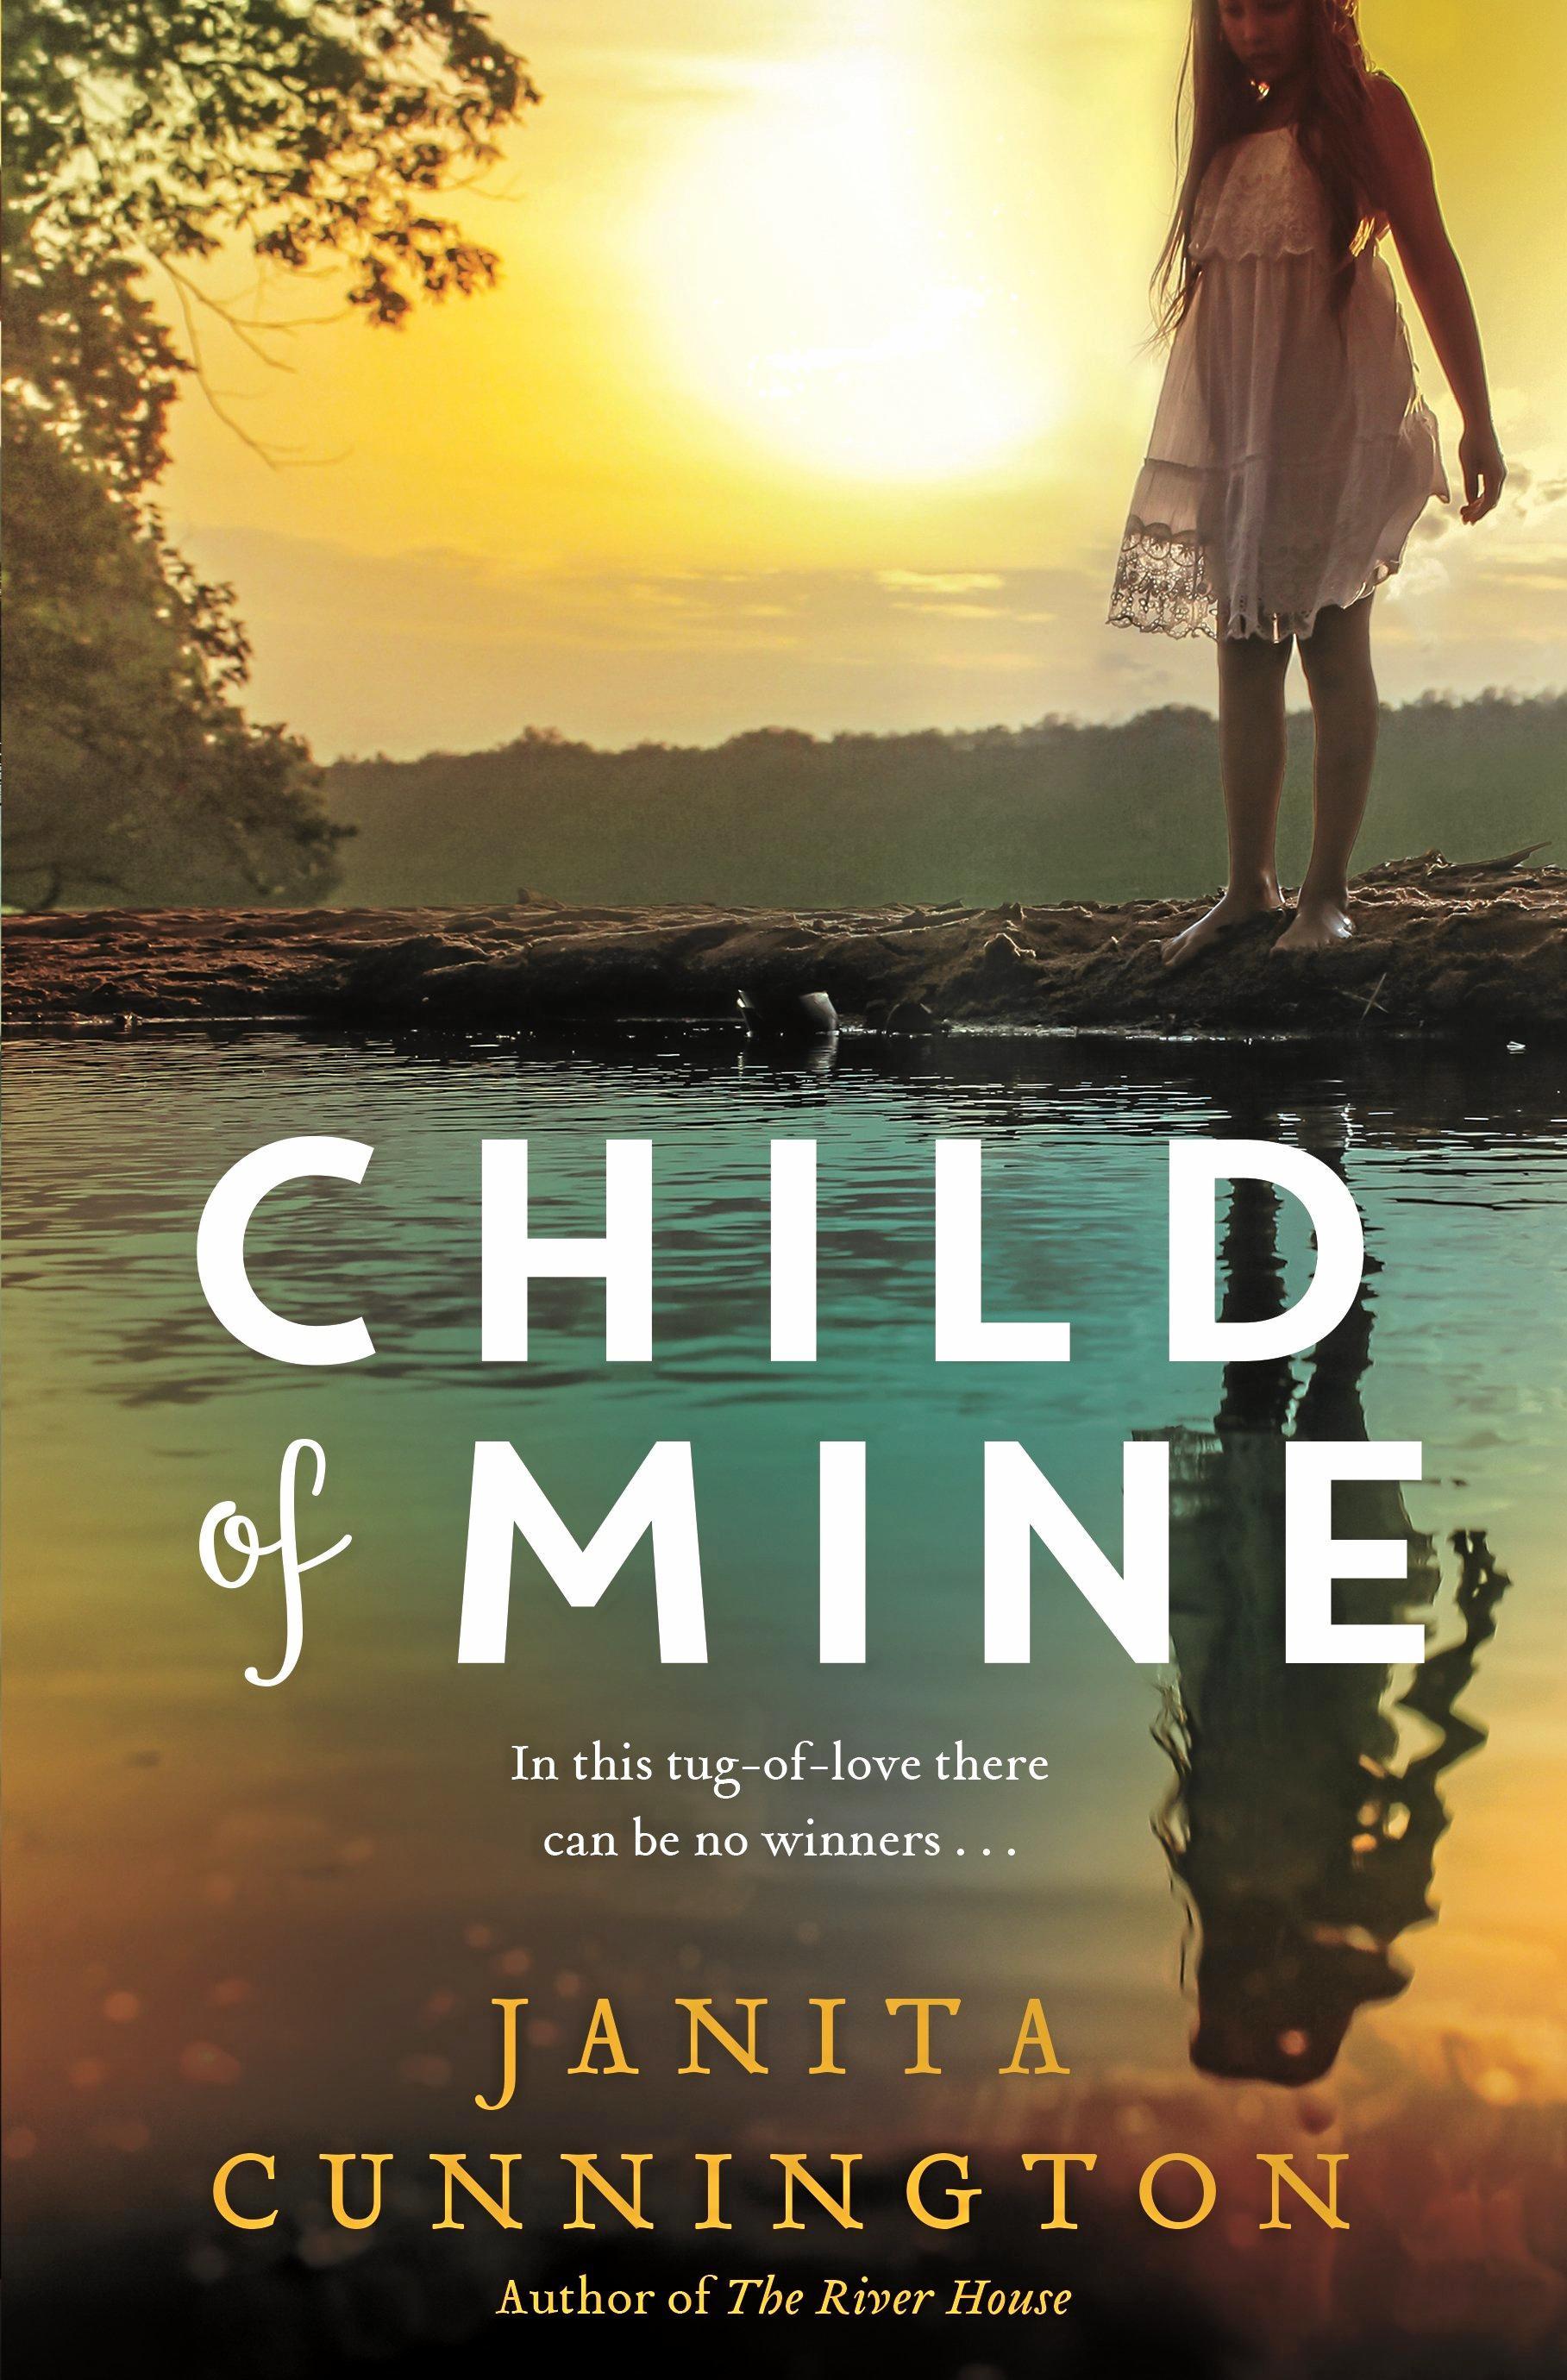 Child of Mine by Janita Cunnington.